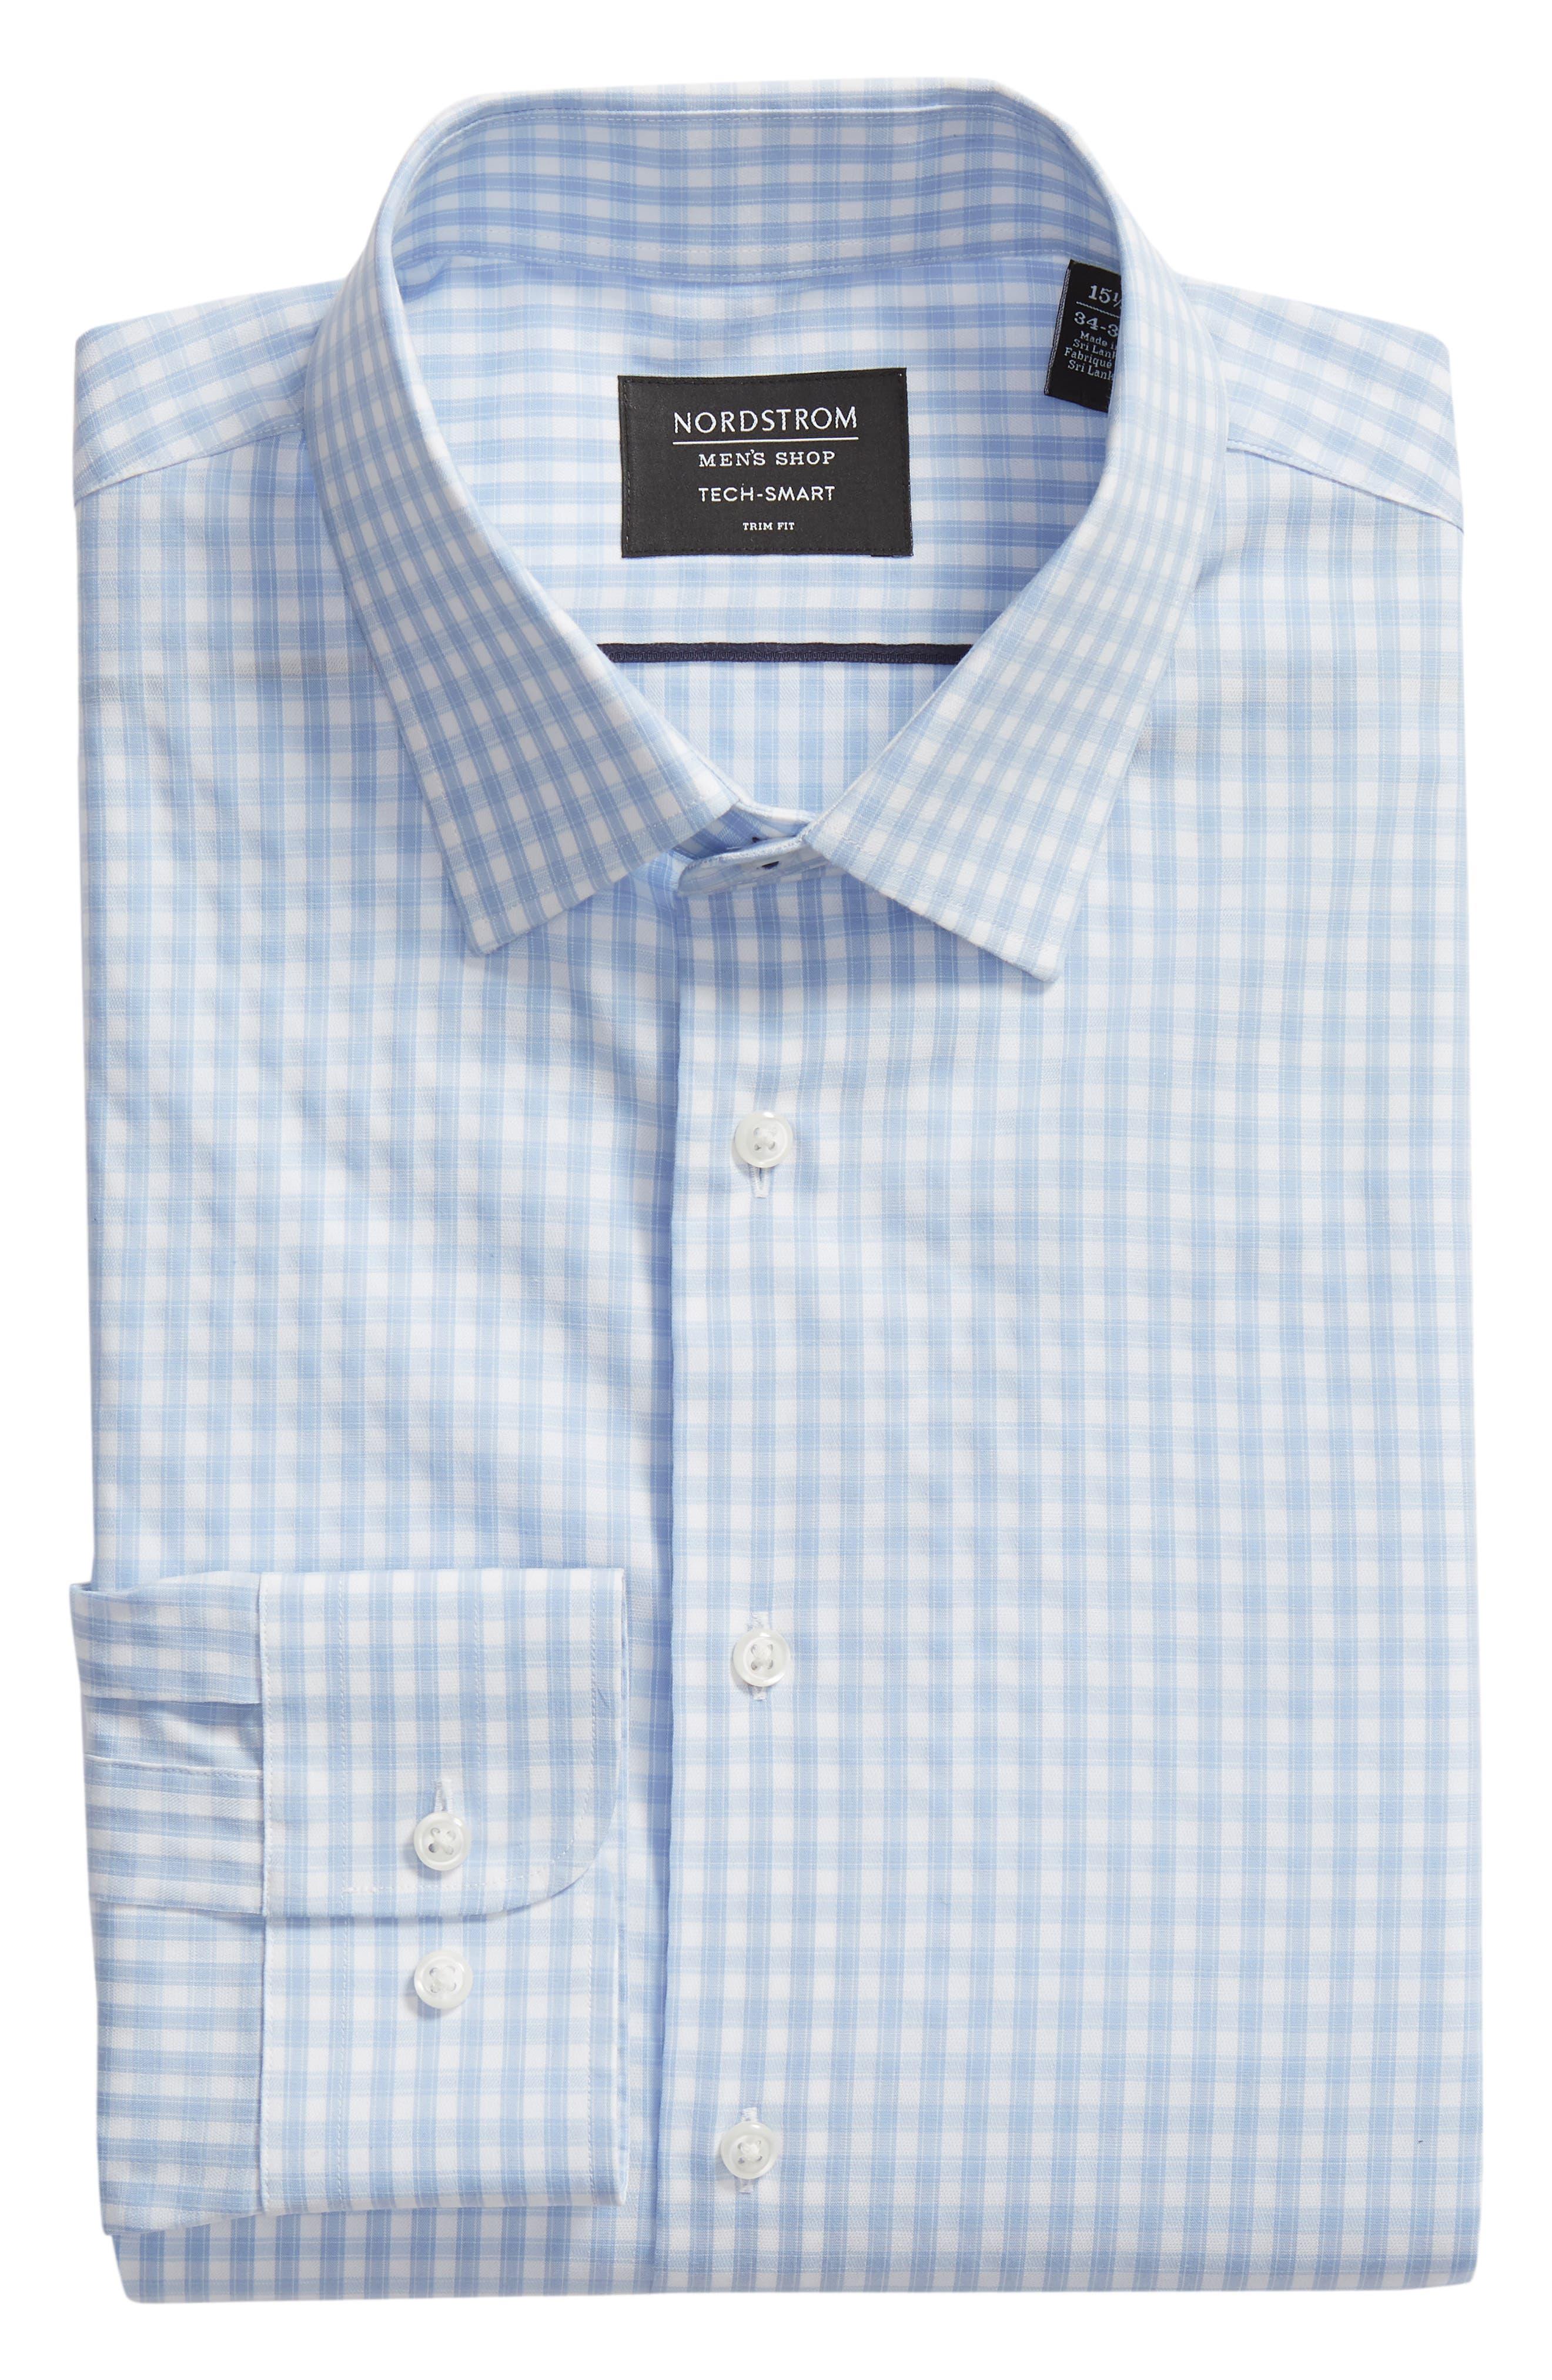 Tech-Smart Trim Fit Stretch Check Dress Shirt,                             Alternate thumbnail 5, color,                             BLUE BRUNNERA